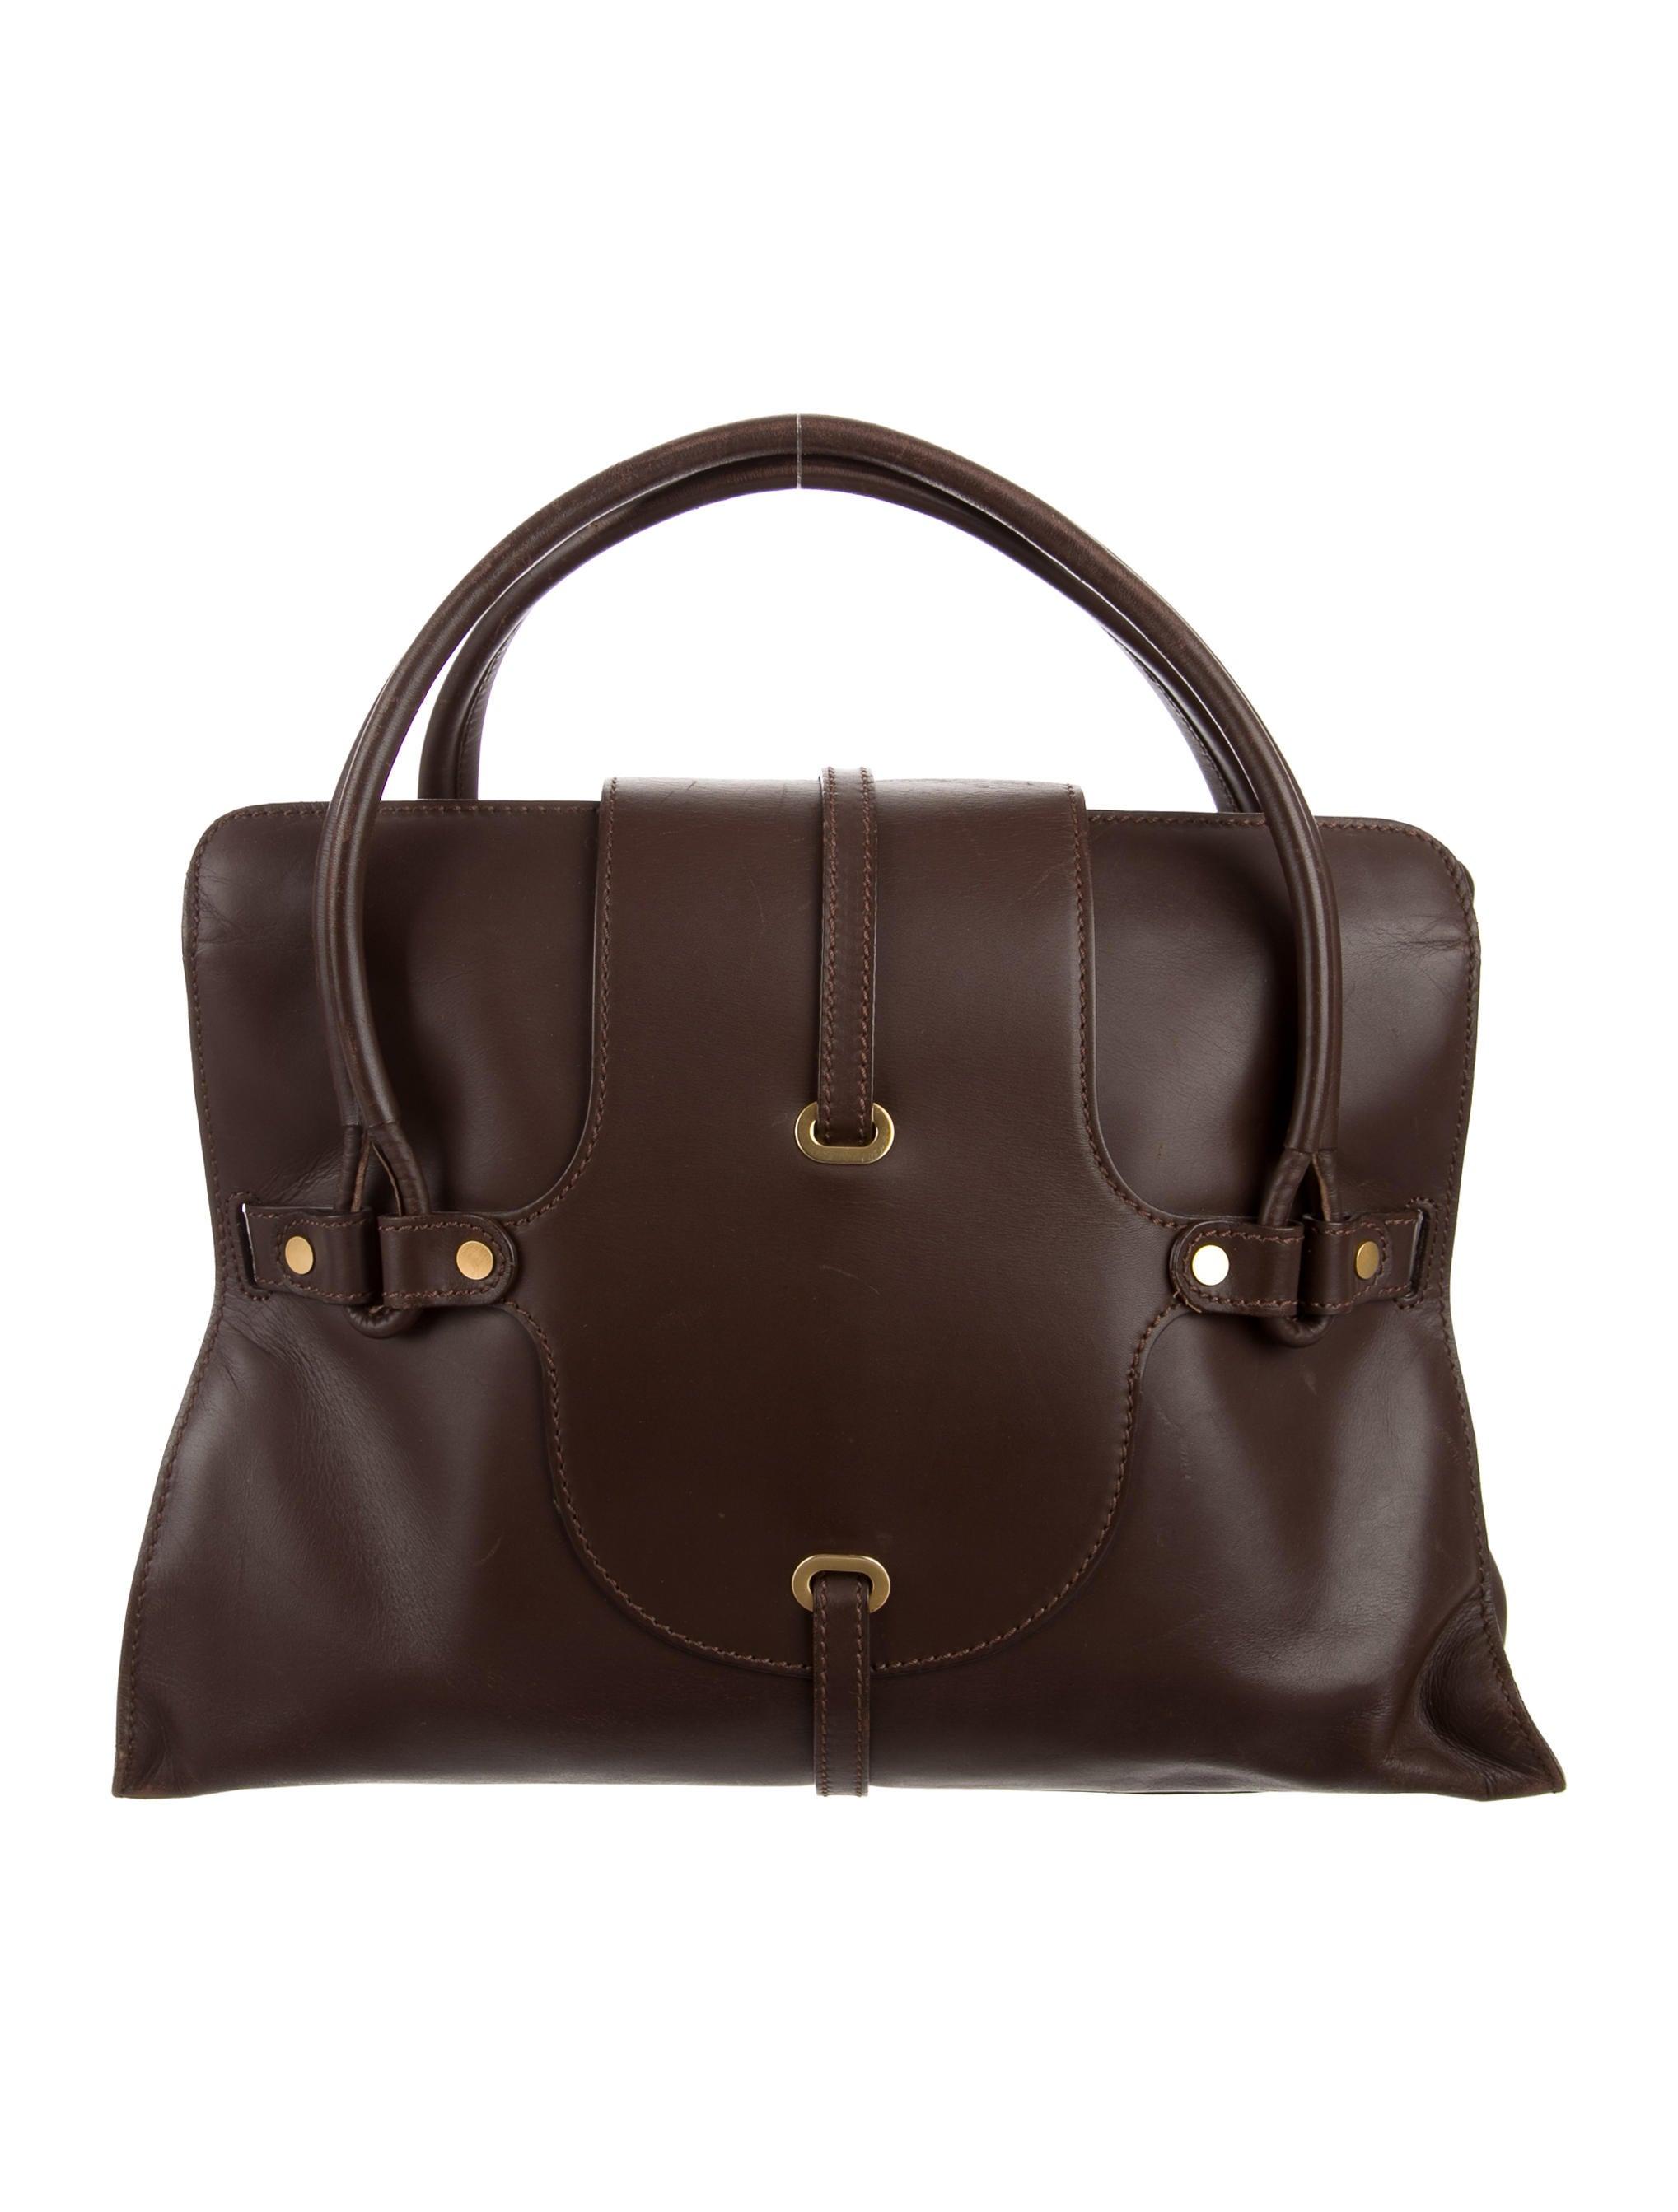 Jimmy Choo Large Tulita Bag Handbags Jim50500 The